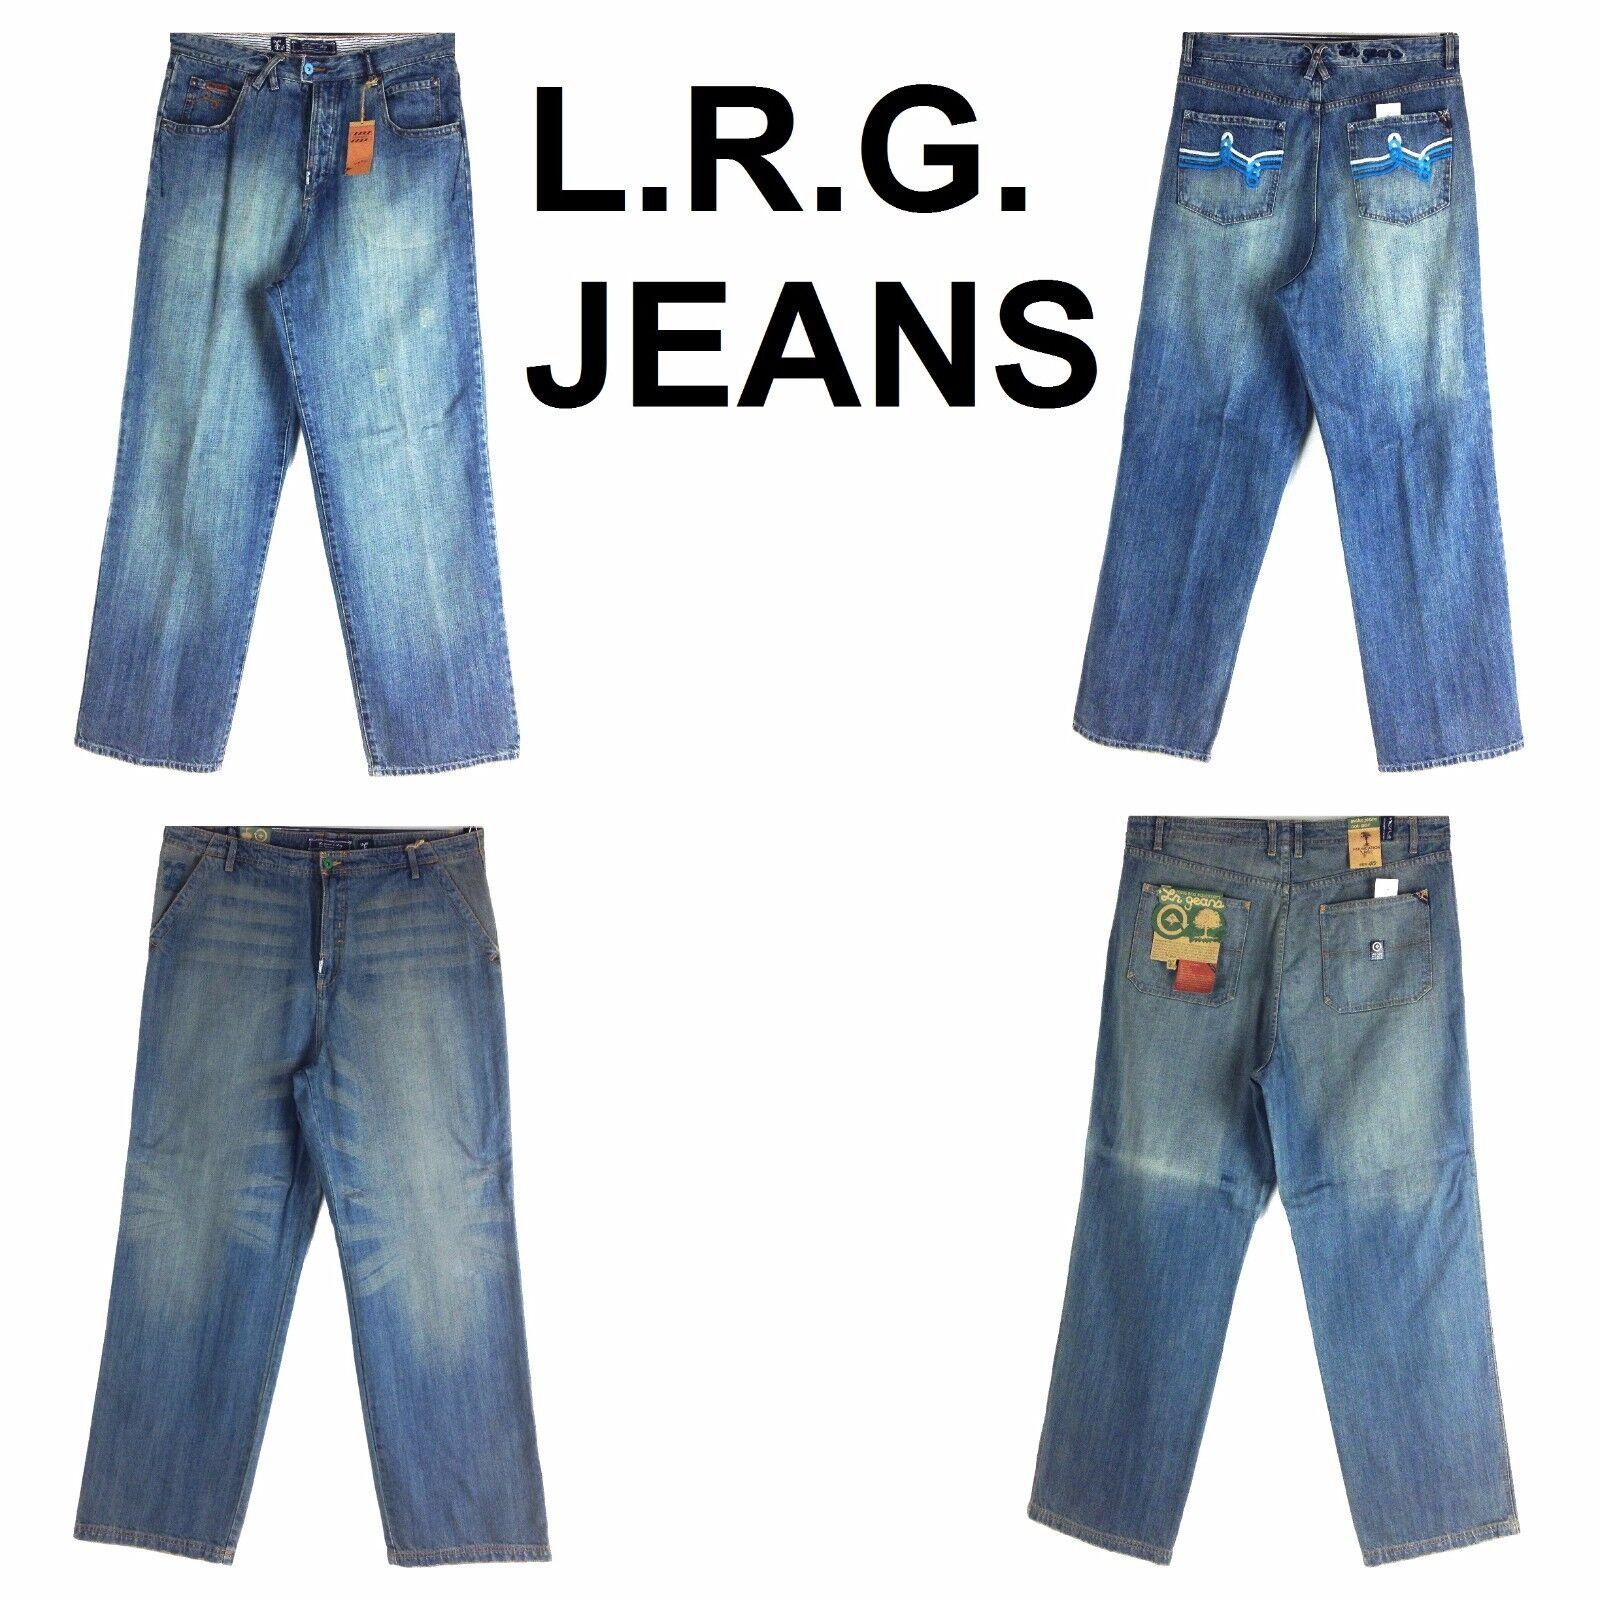 L.R.G. JEAN ASSORTED STYLE, OLD SCHOOL BAGGY, MEN'S LONG DENIM JEANS,